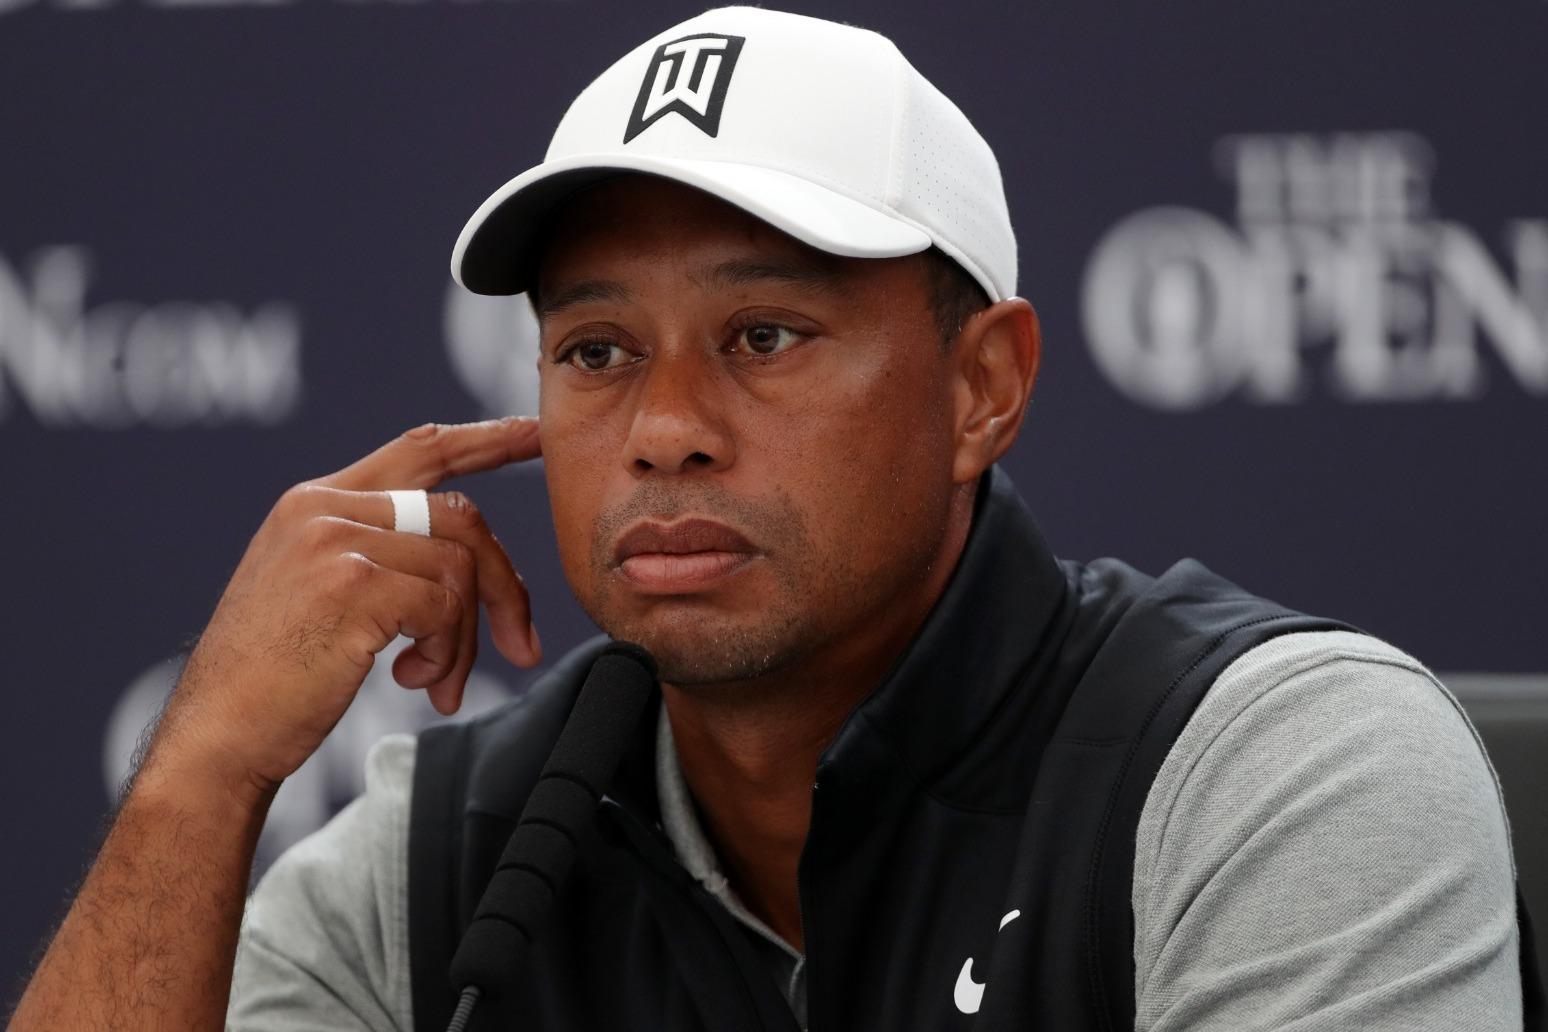 Tiger Woods suffers leg injuries in California car crash